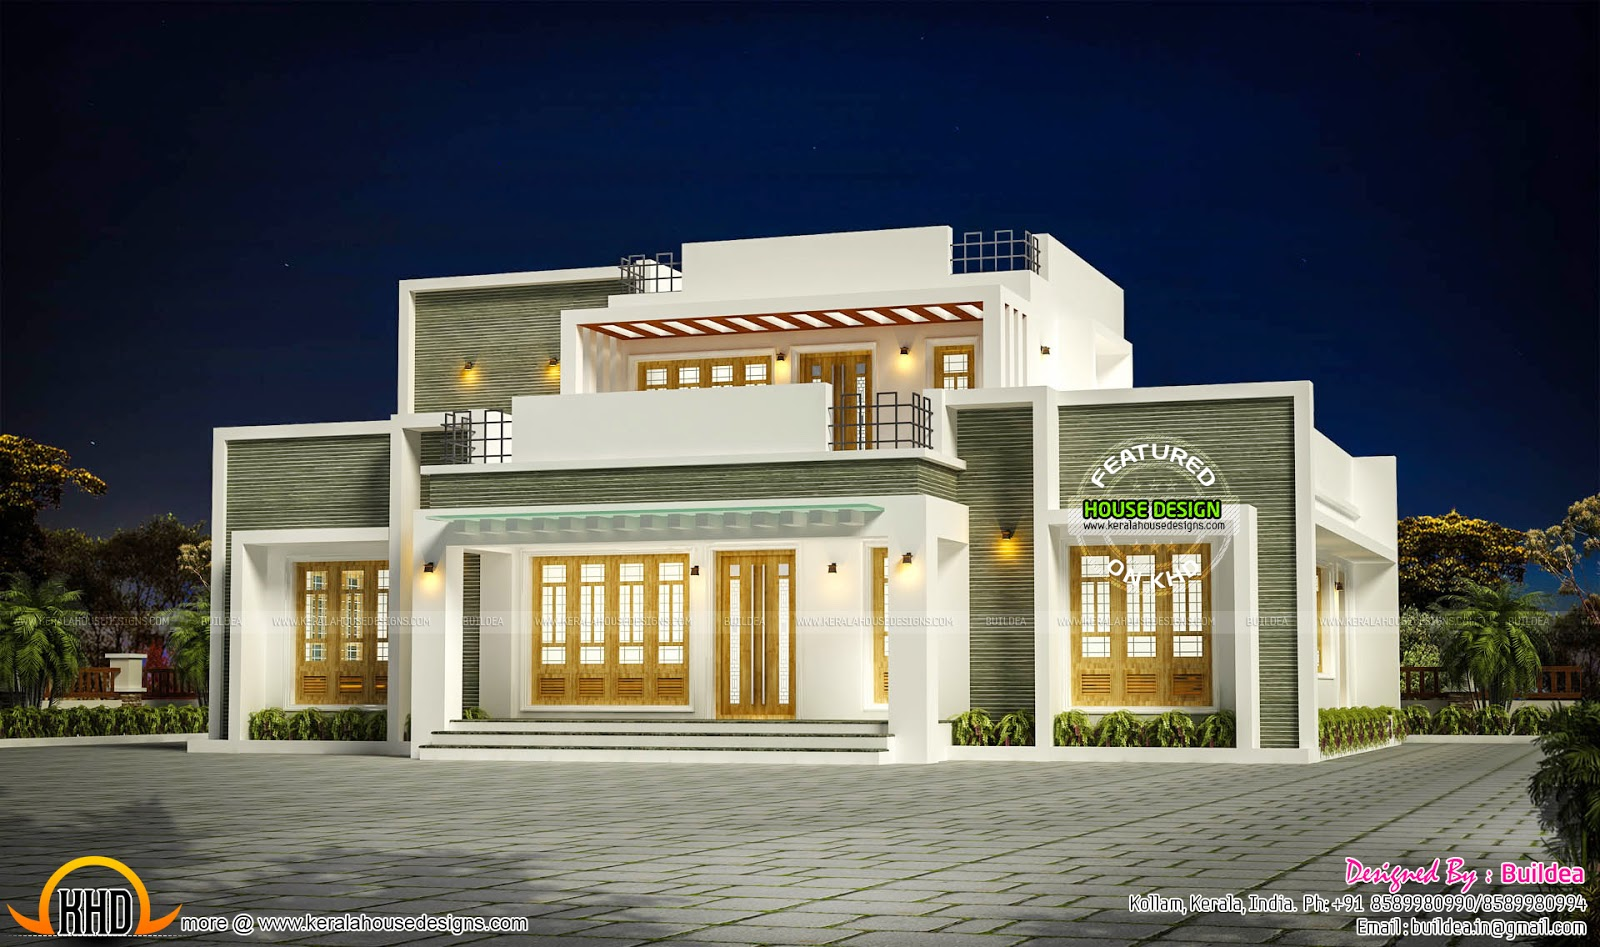 2148 sq ft flat roof house in kollam kerala kerala home design and floor plans. Black Bedroom Furniture Sets. Home Design Ideas